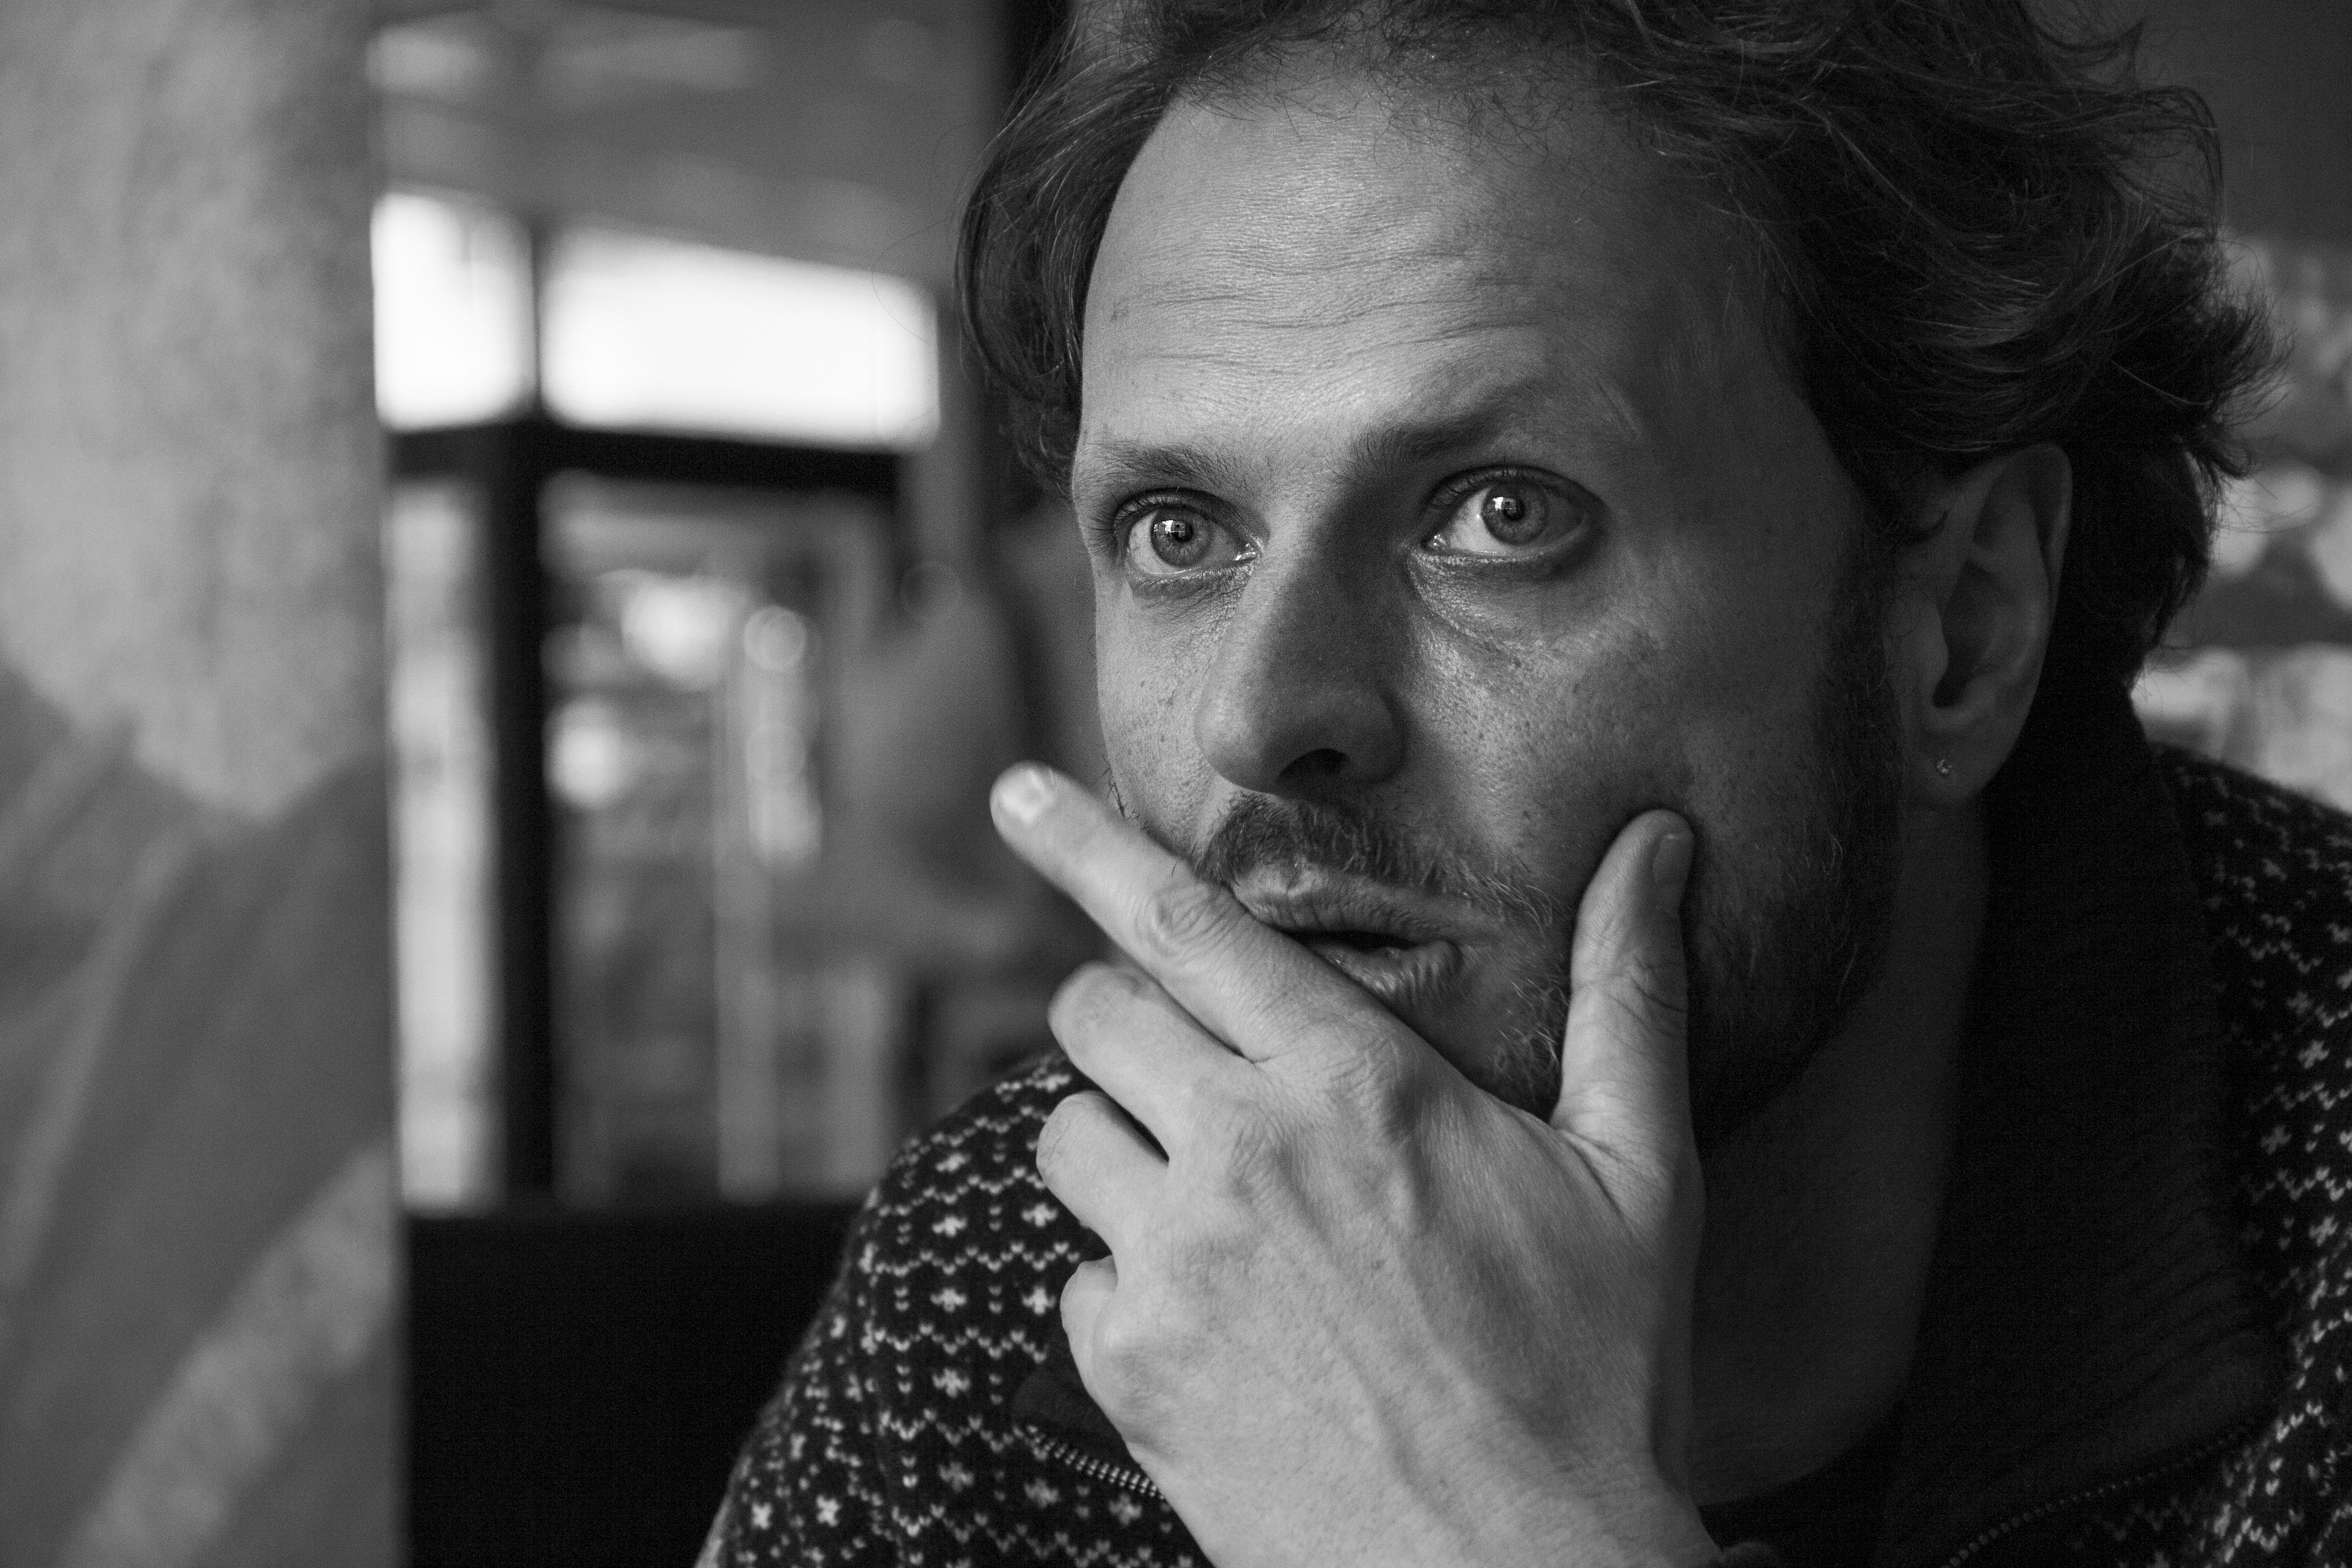 Michal Havran: Verejná diskusia je dnes na ústupe